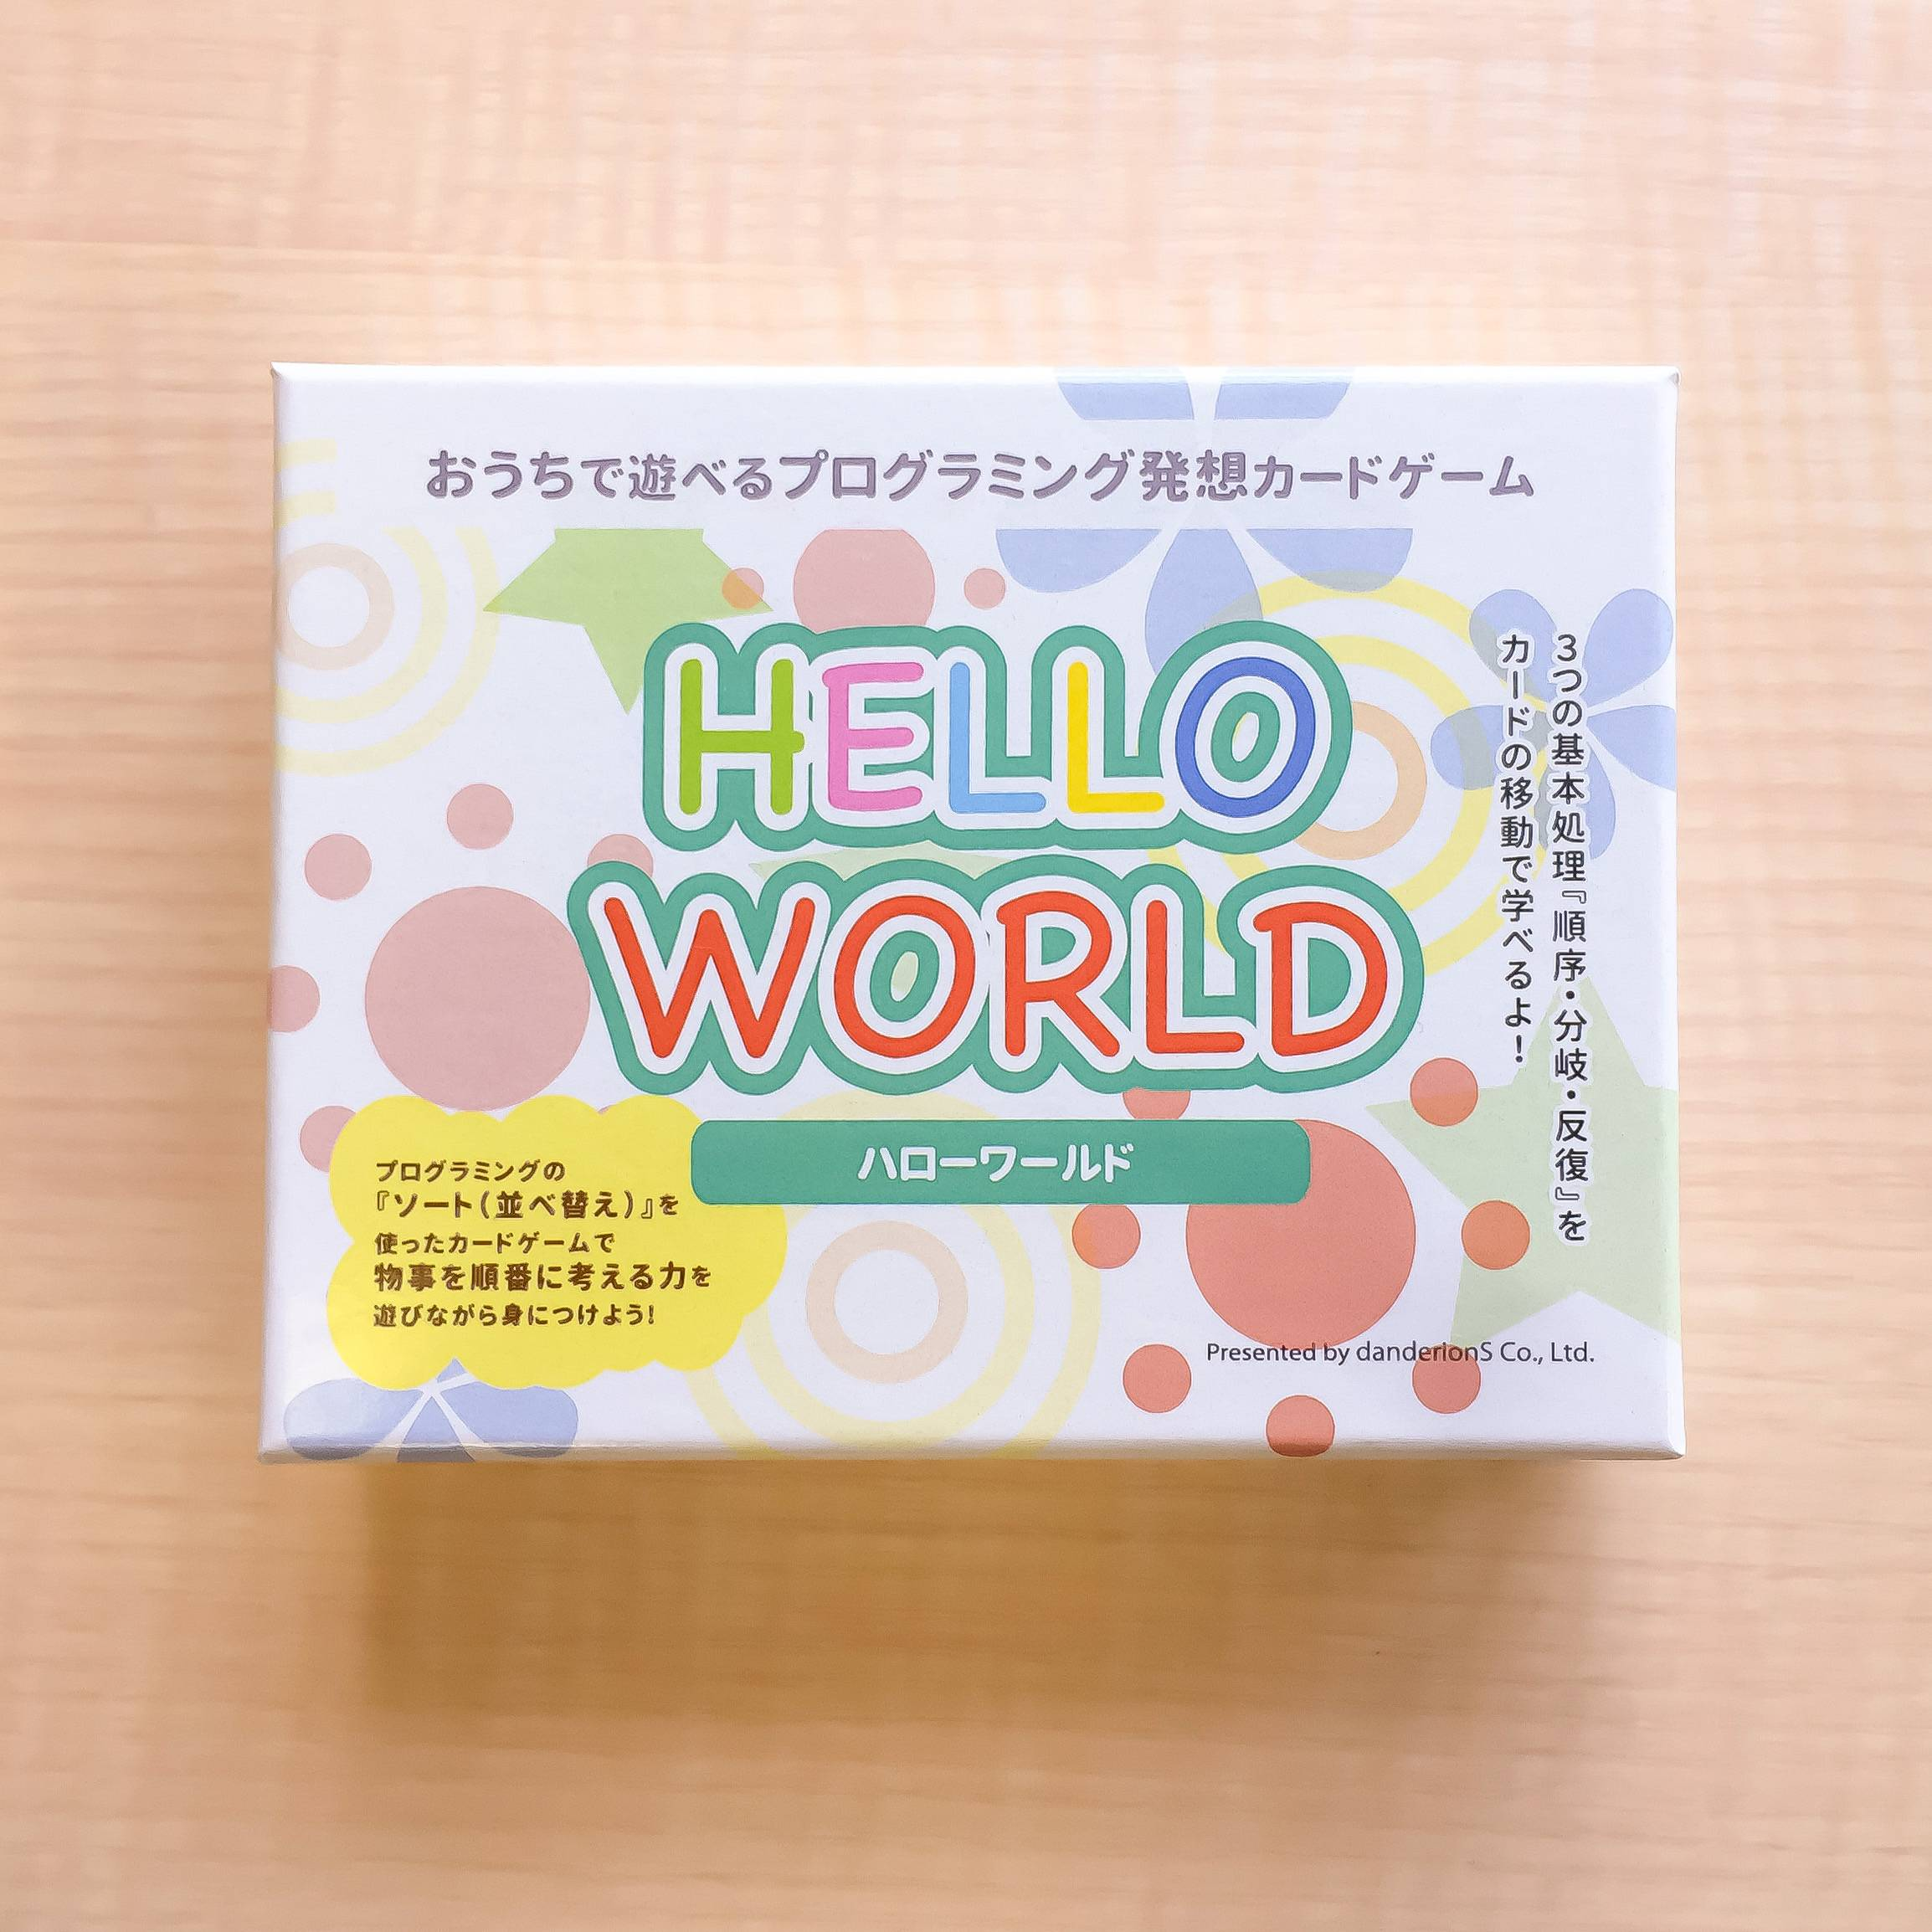 HELLO WORLD画像